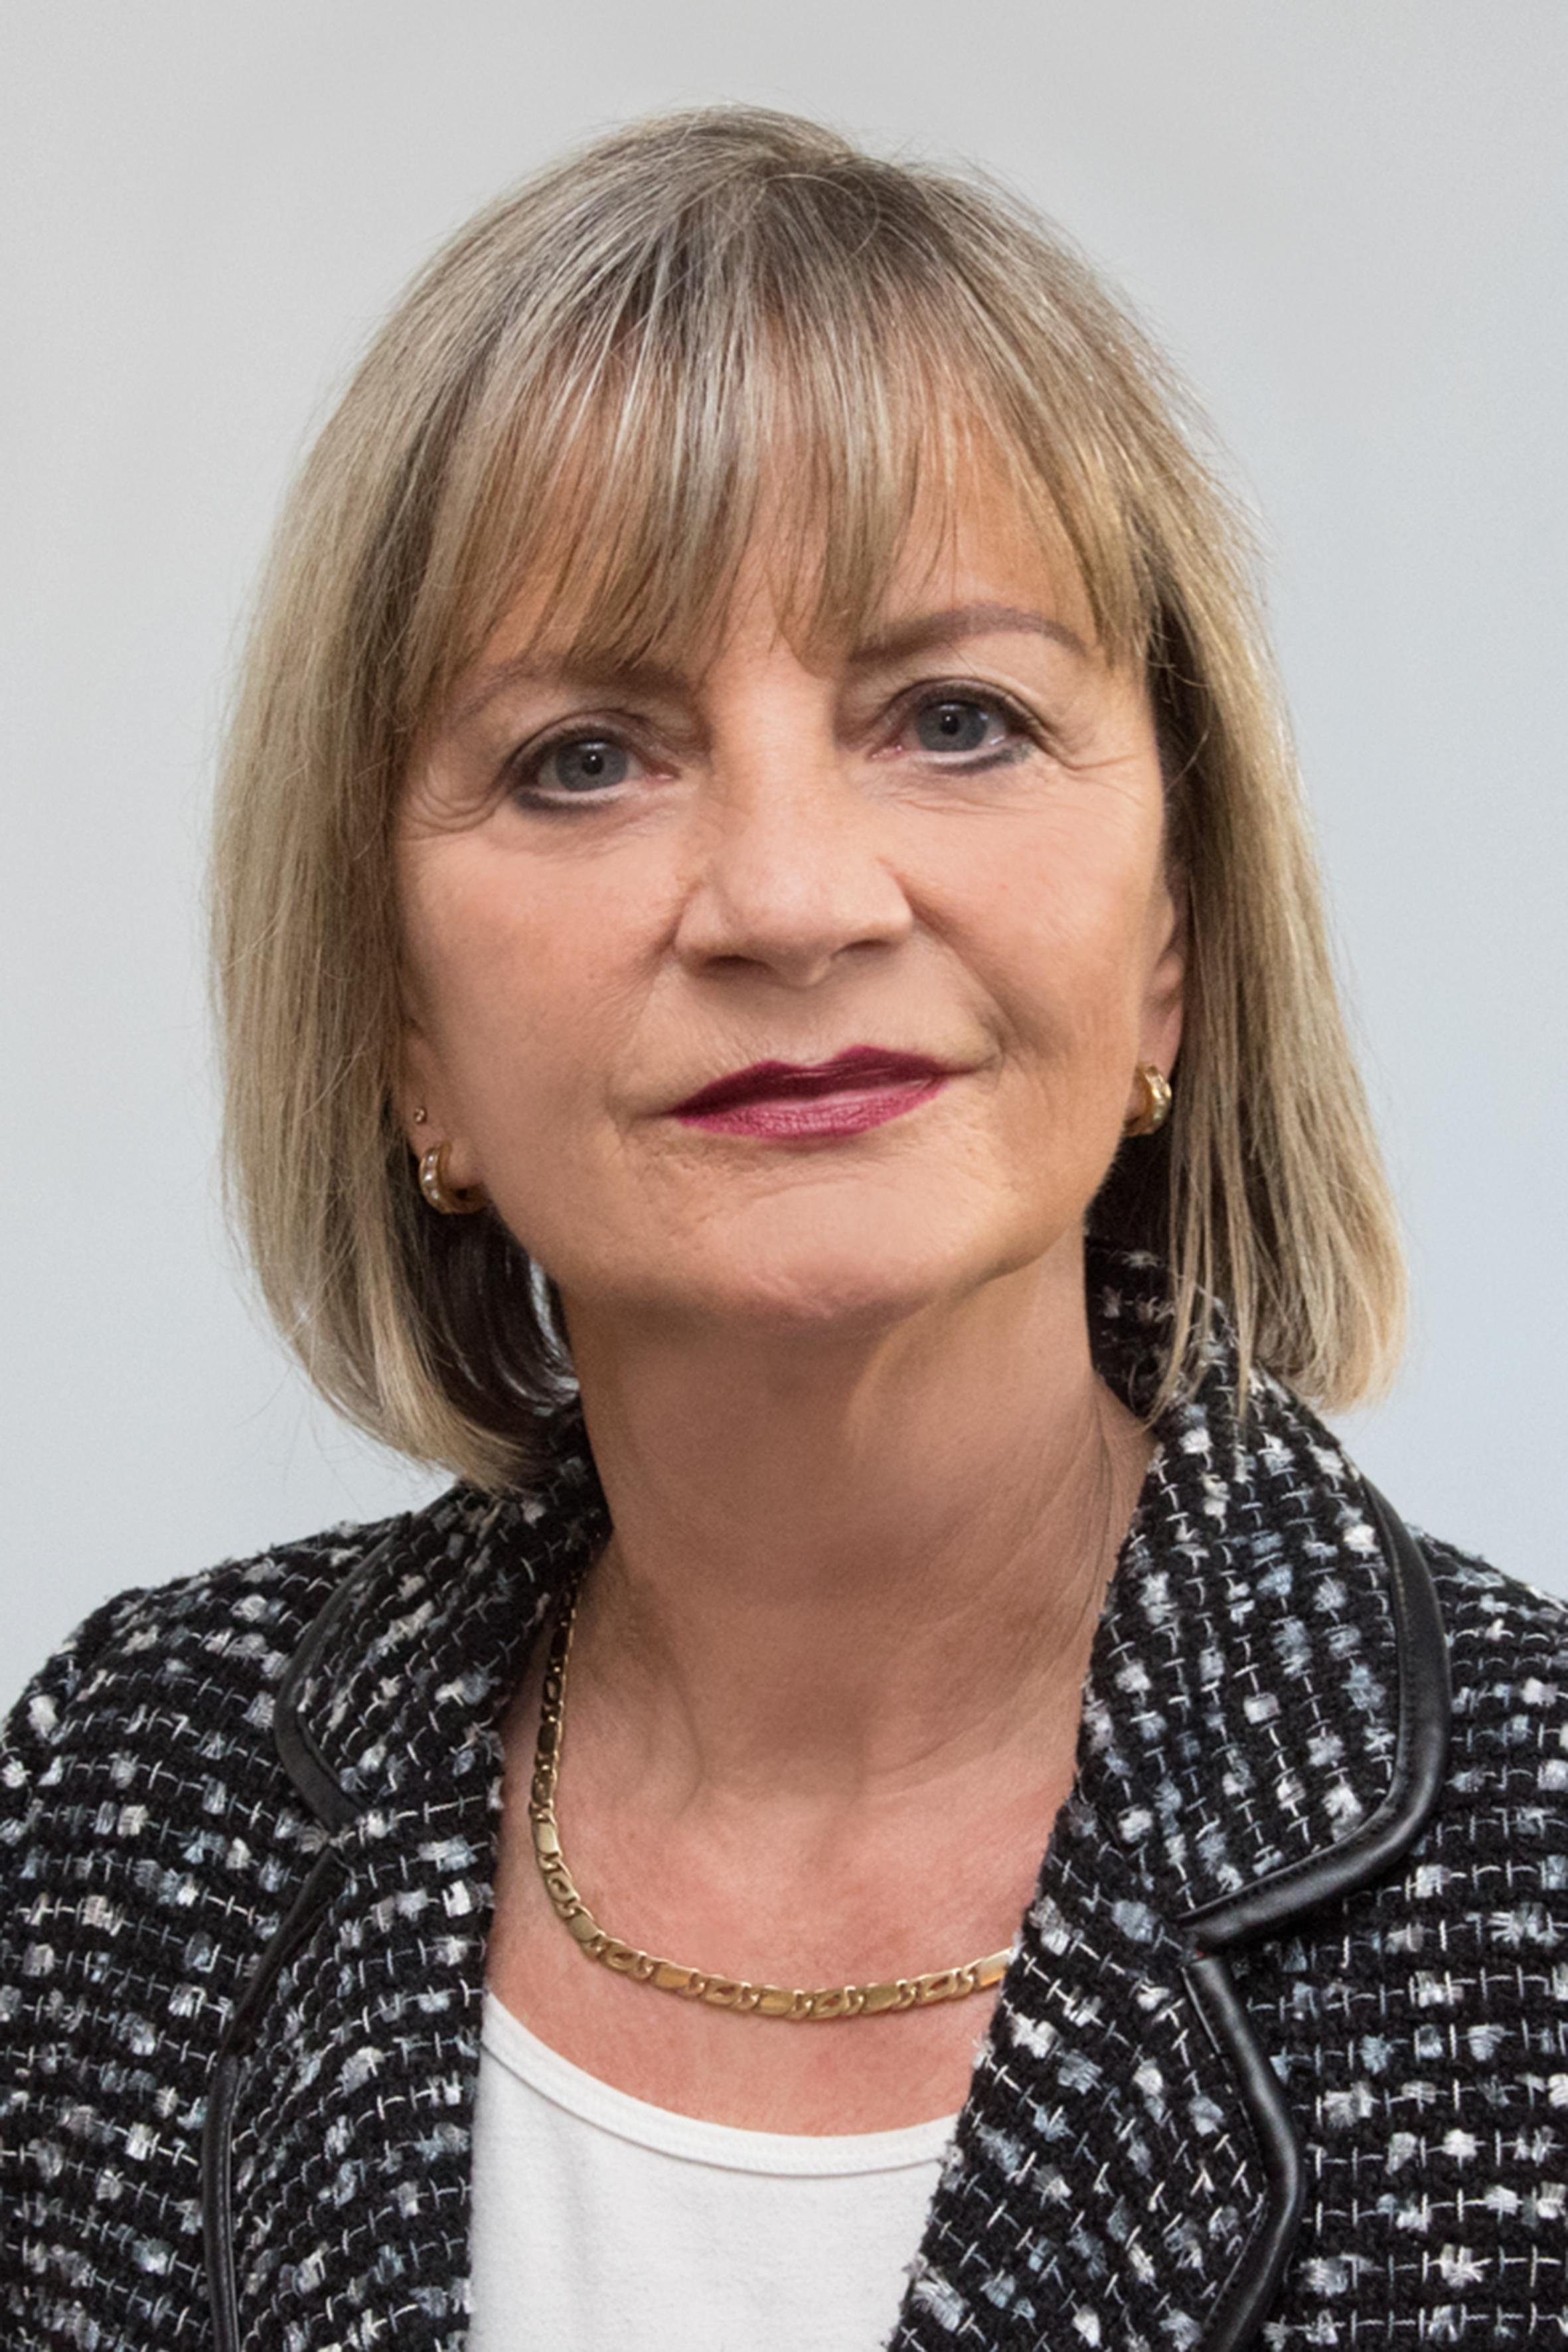 Roswitha Lehmann